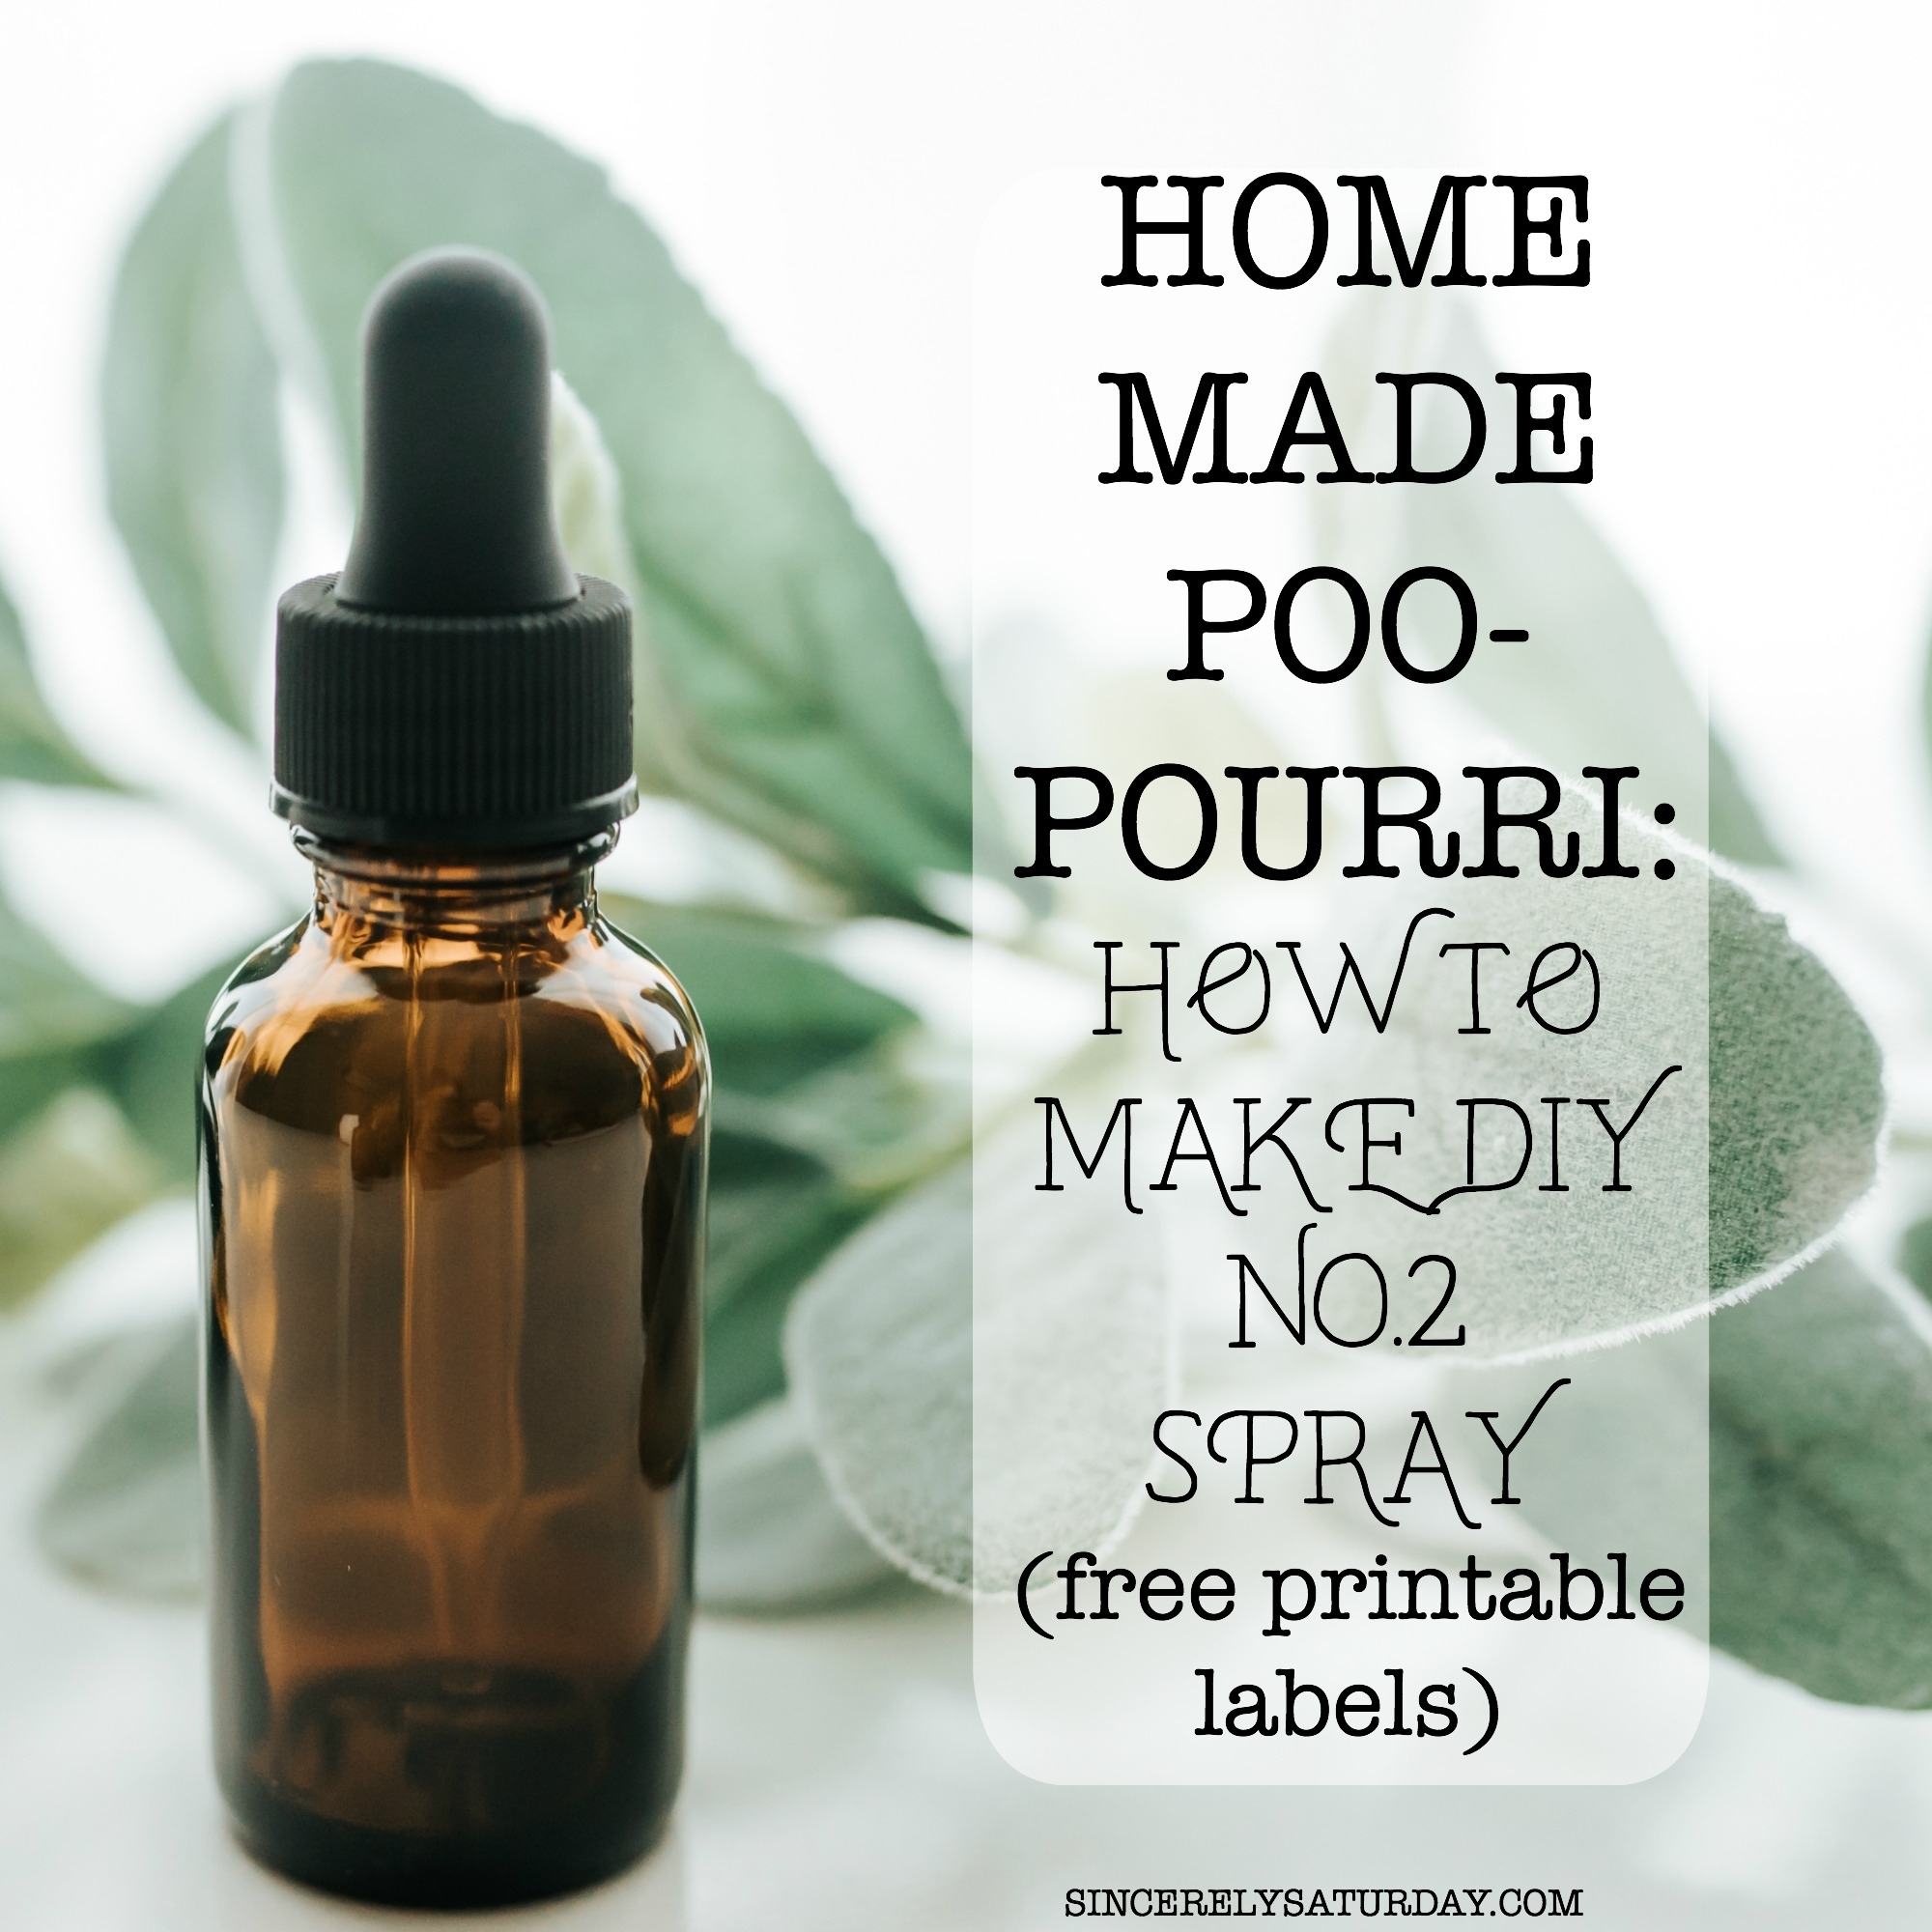 Homemade Poo-Pourri: How to make DIY No.2 spray (Printable labels included)